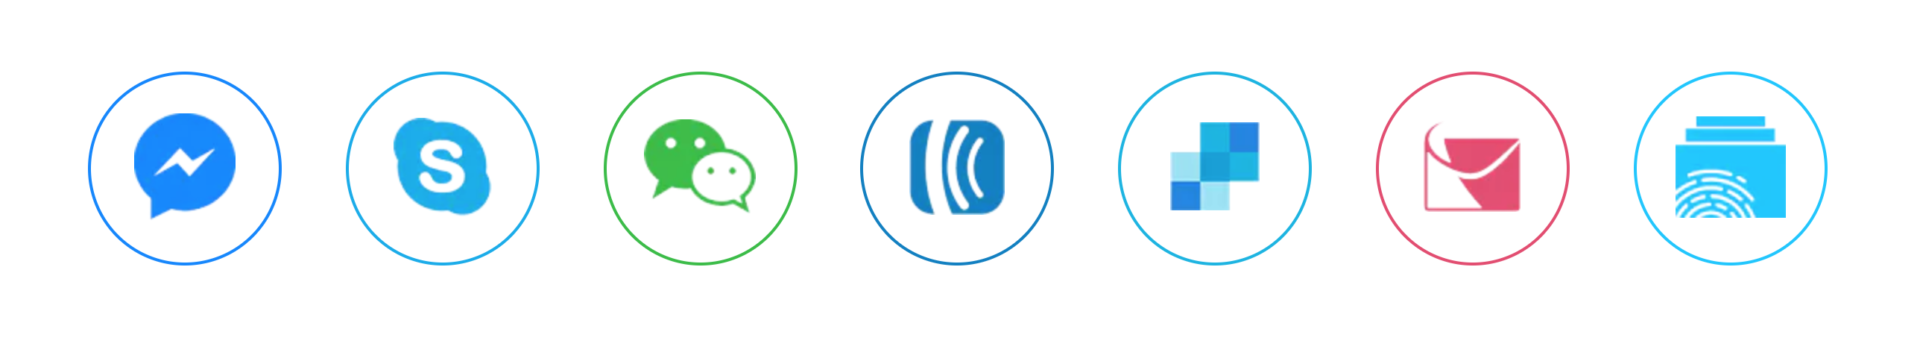 customer engagement system